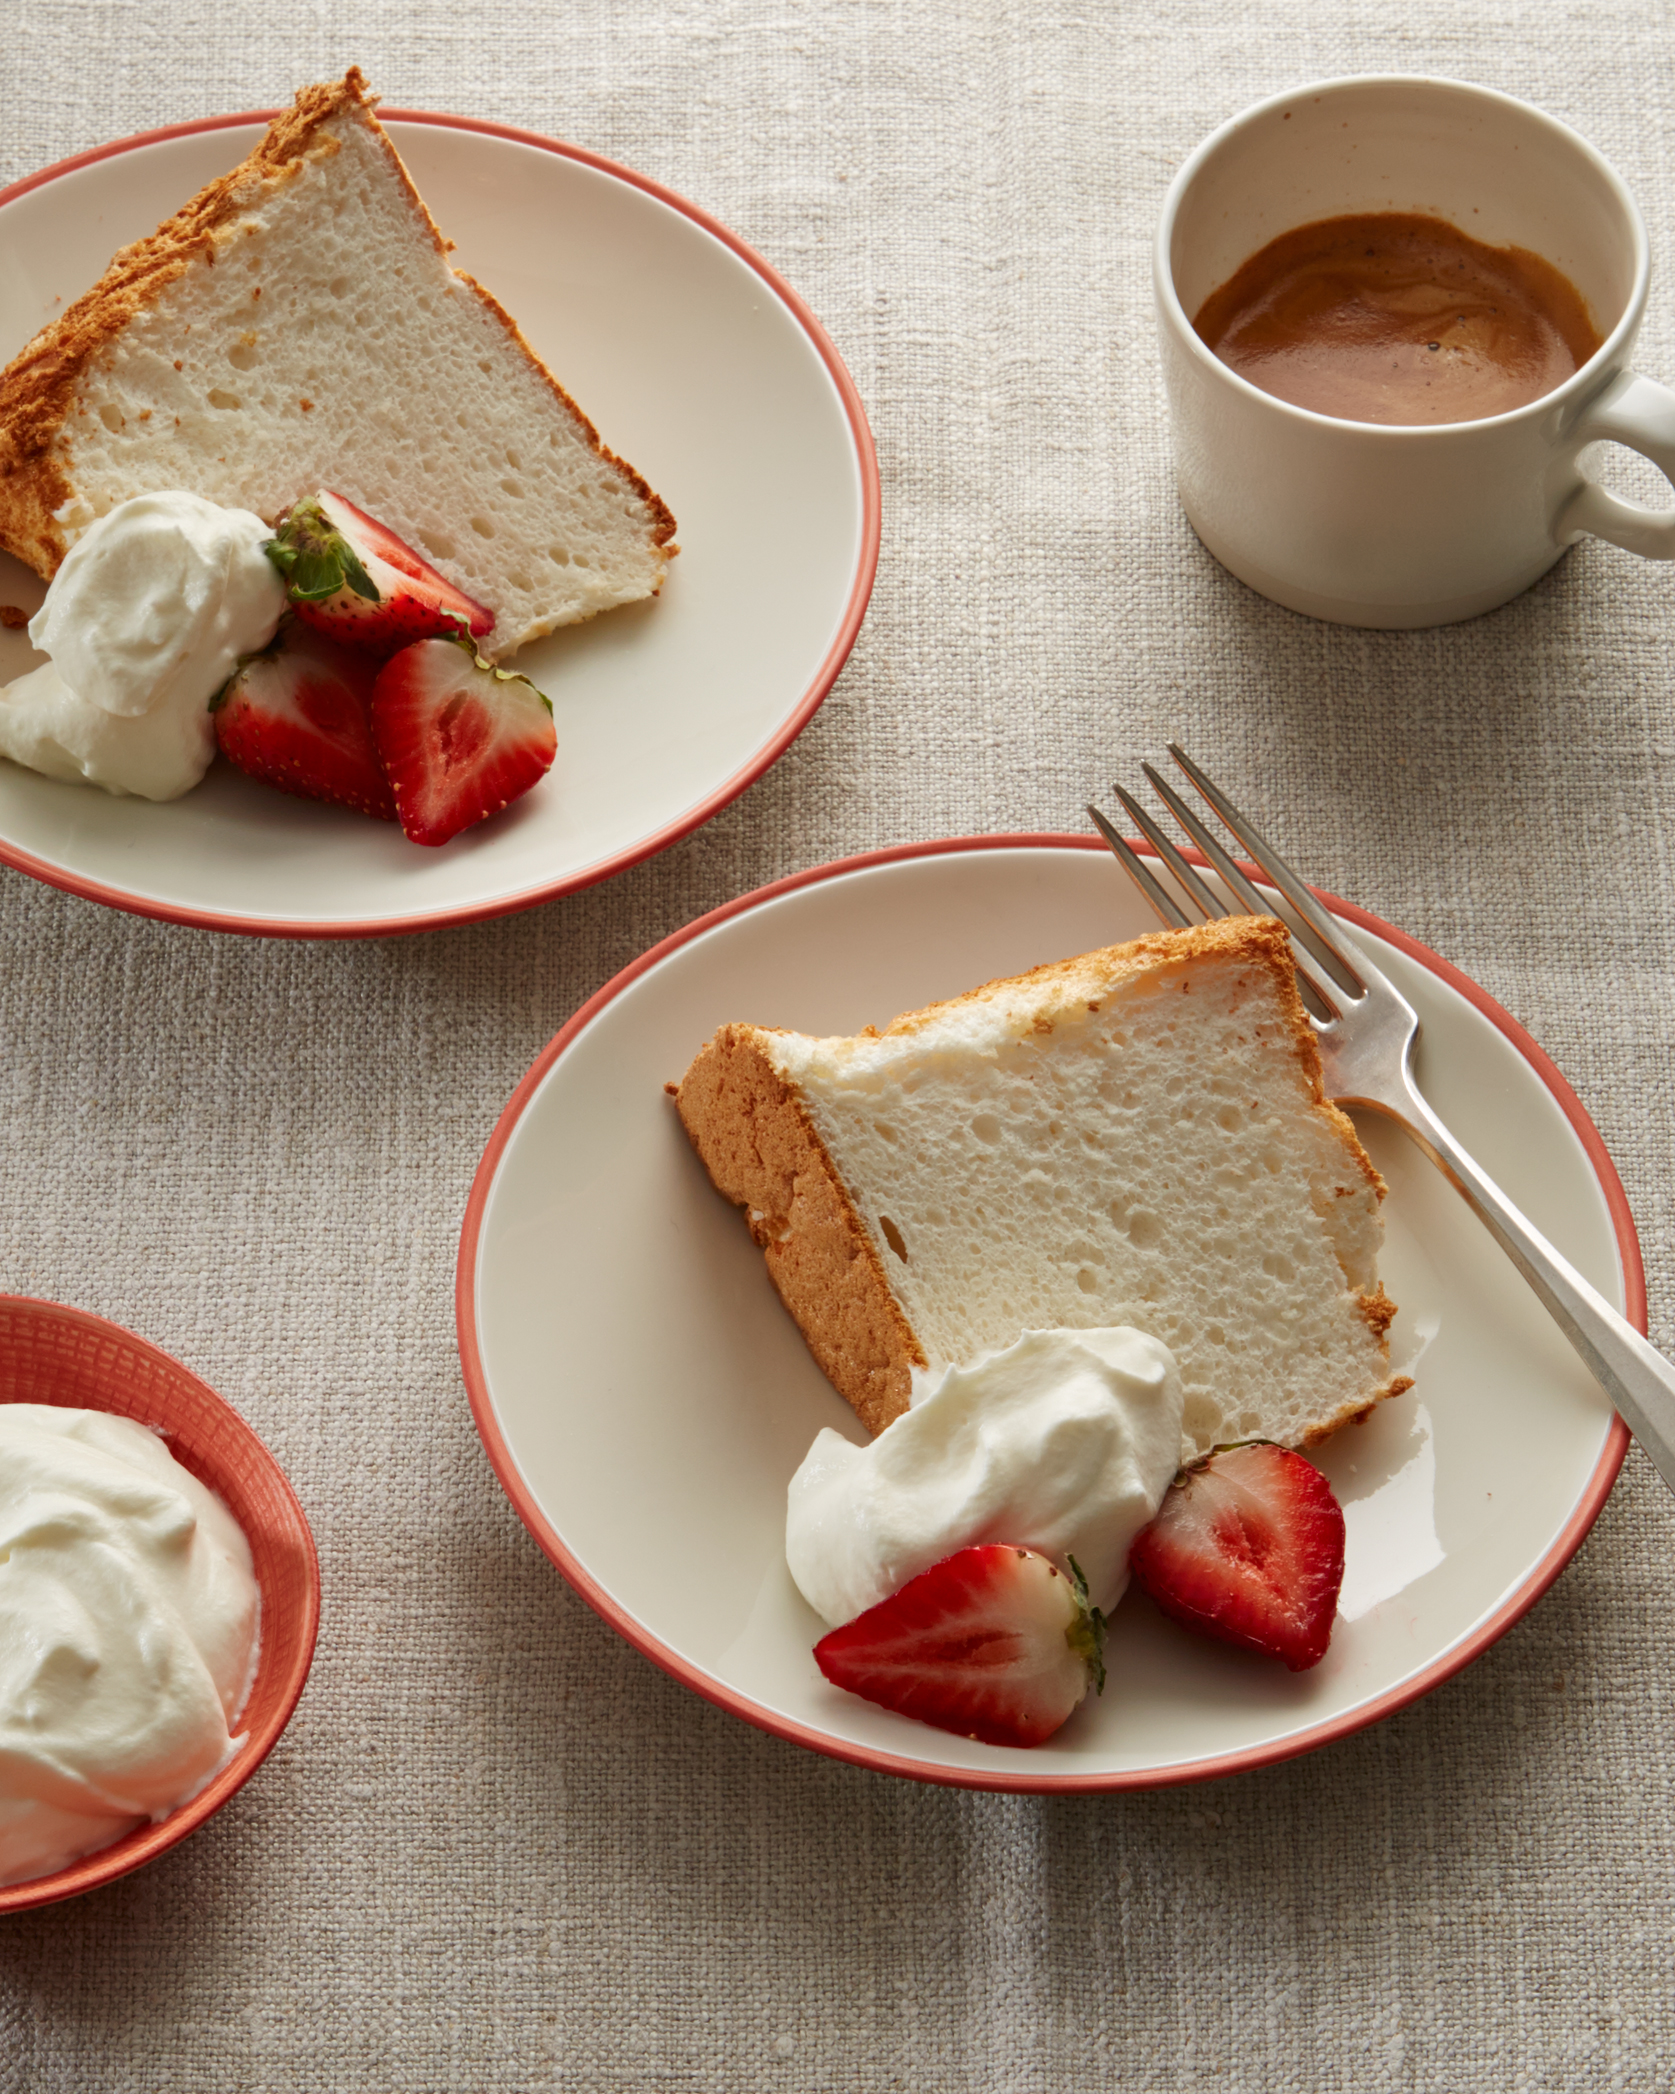 gluten-free-angel-food-cake-2955-d112808.jpg